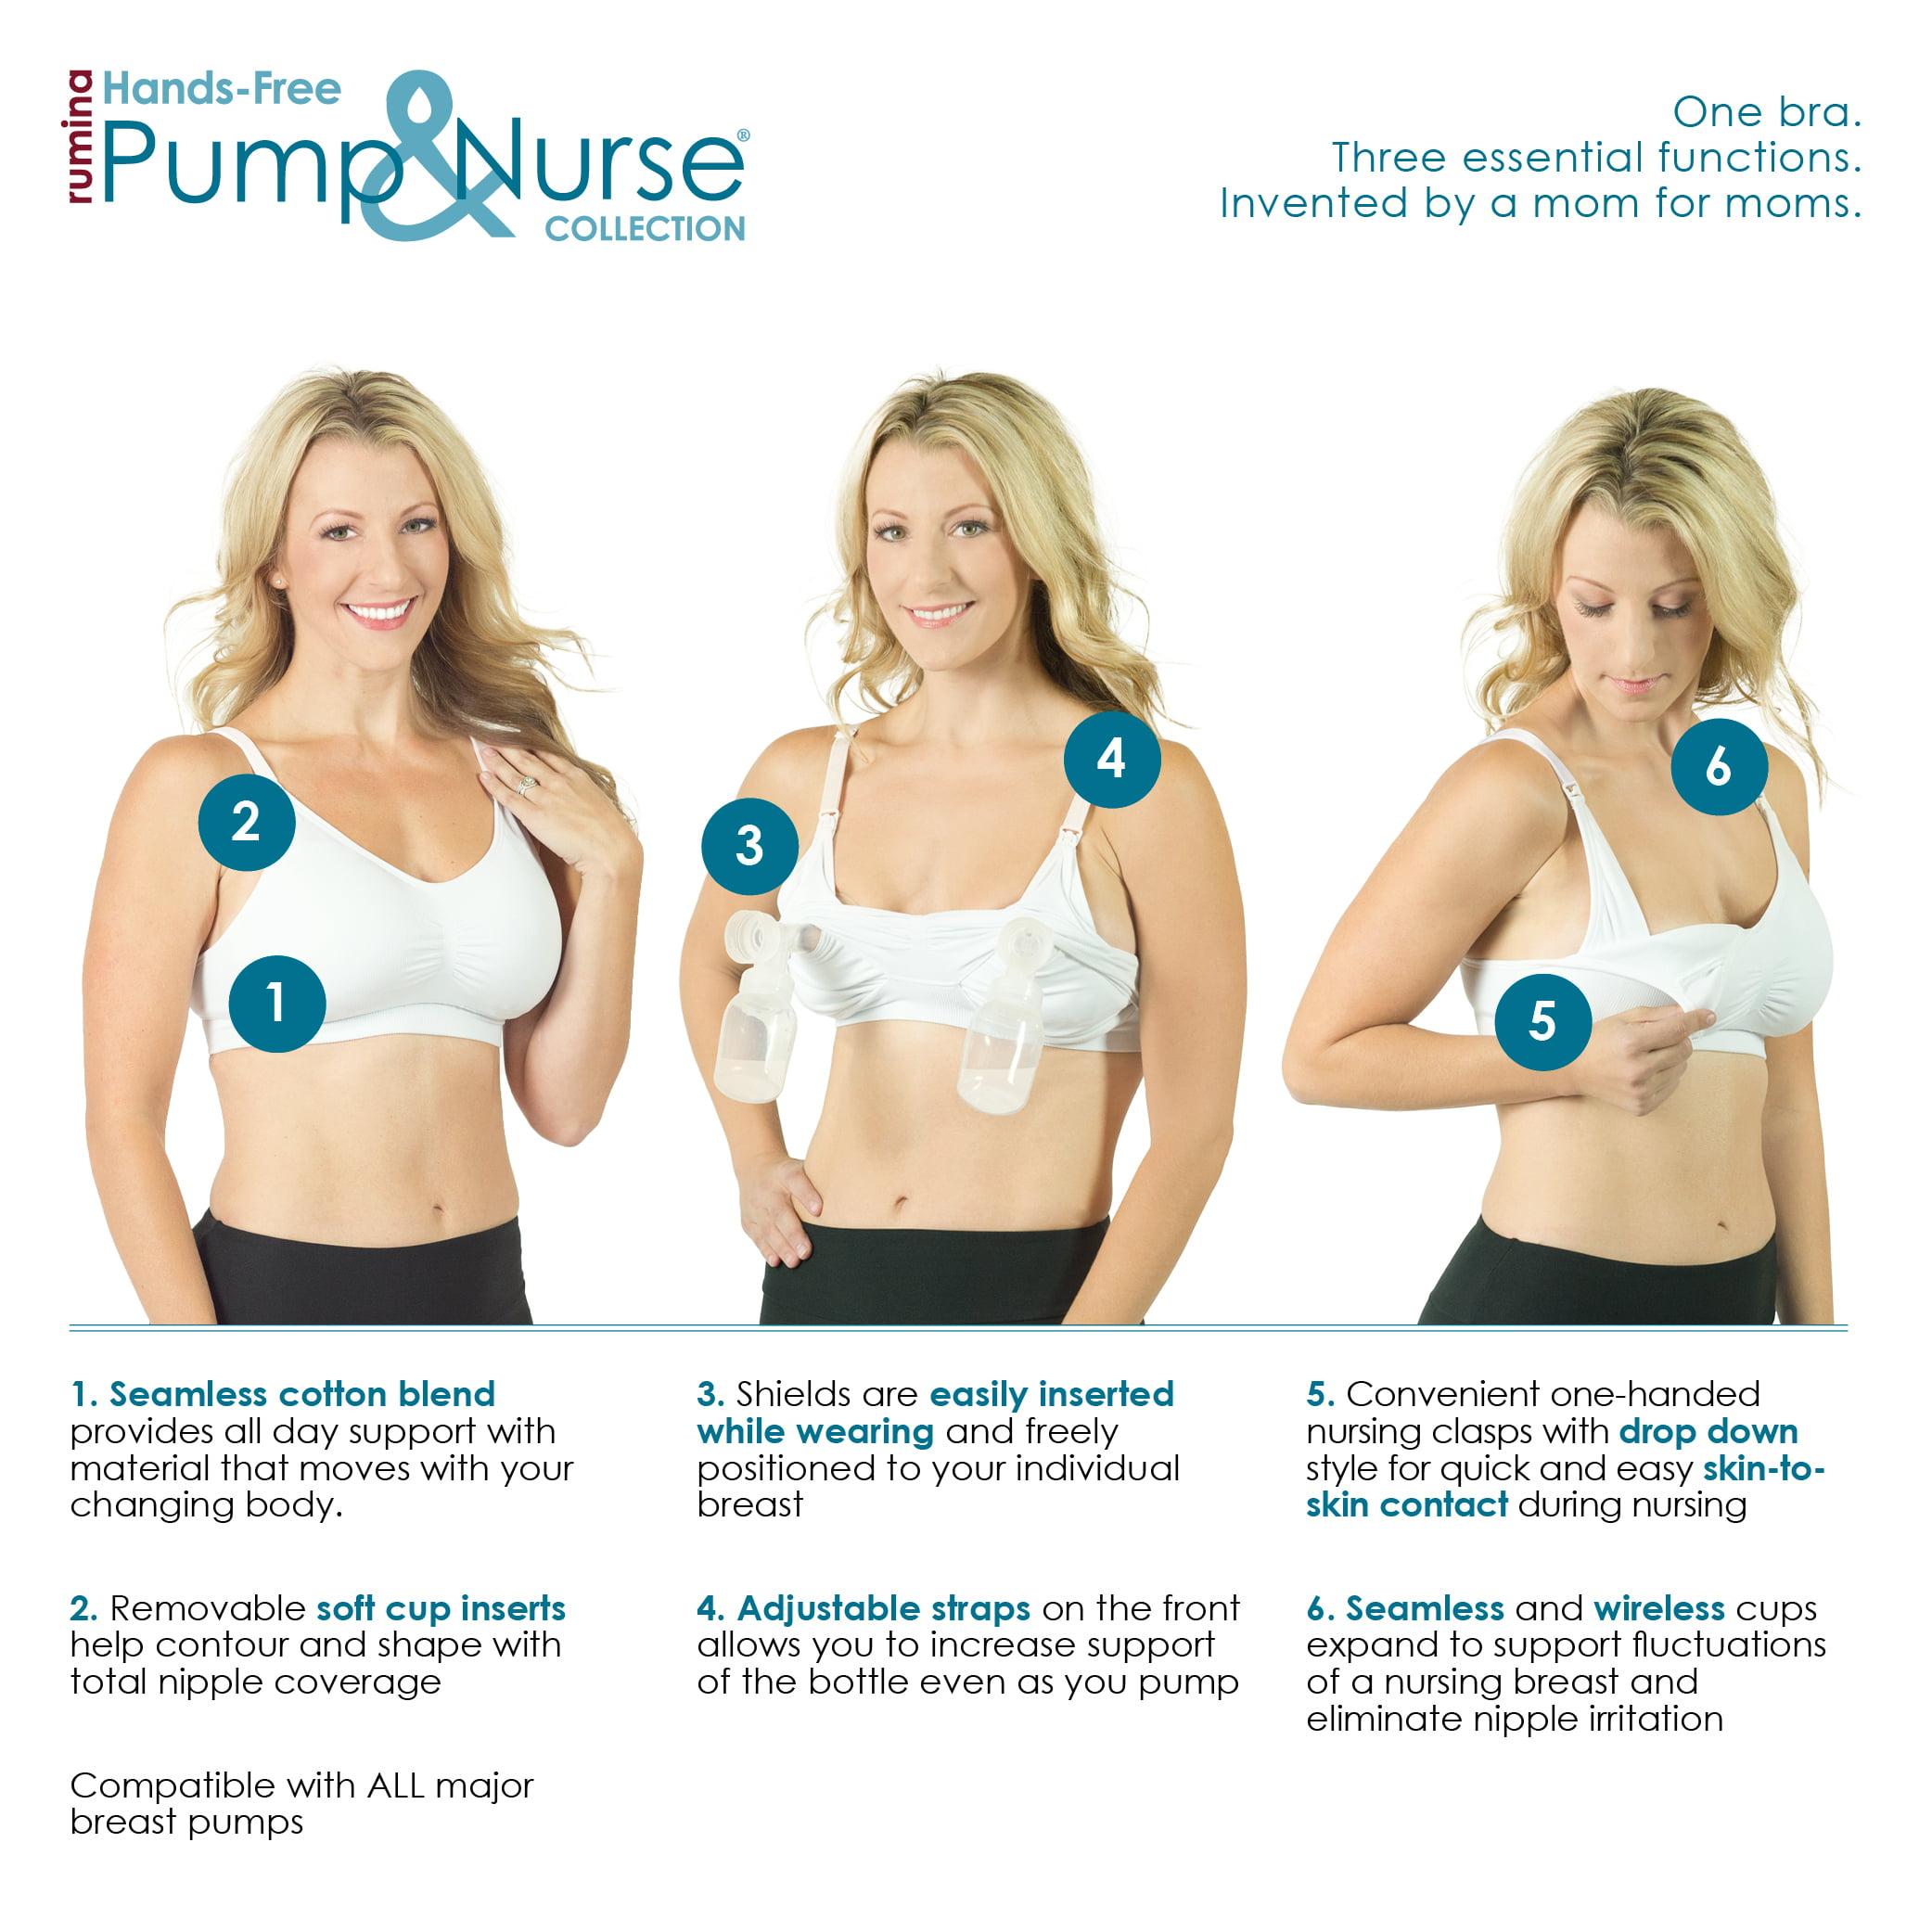 aef2b9e9783c6 Rumina Nursingwear - Rumina Pump&Nurse Seamless All-In-One Nursing Bra For  Maternity, Nursing With Built In Hands-Free Pumping Bra - Walmart.com